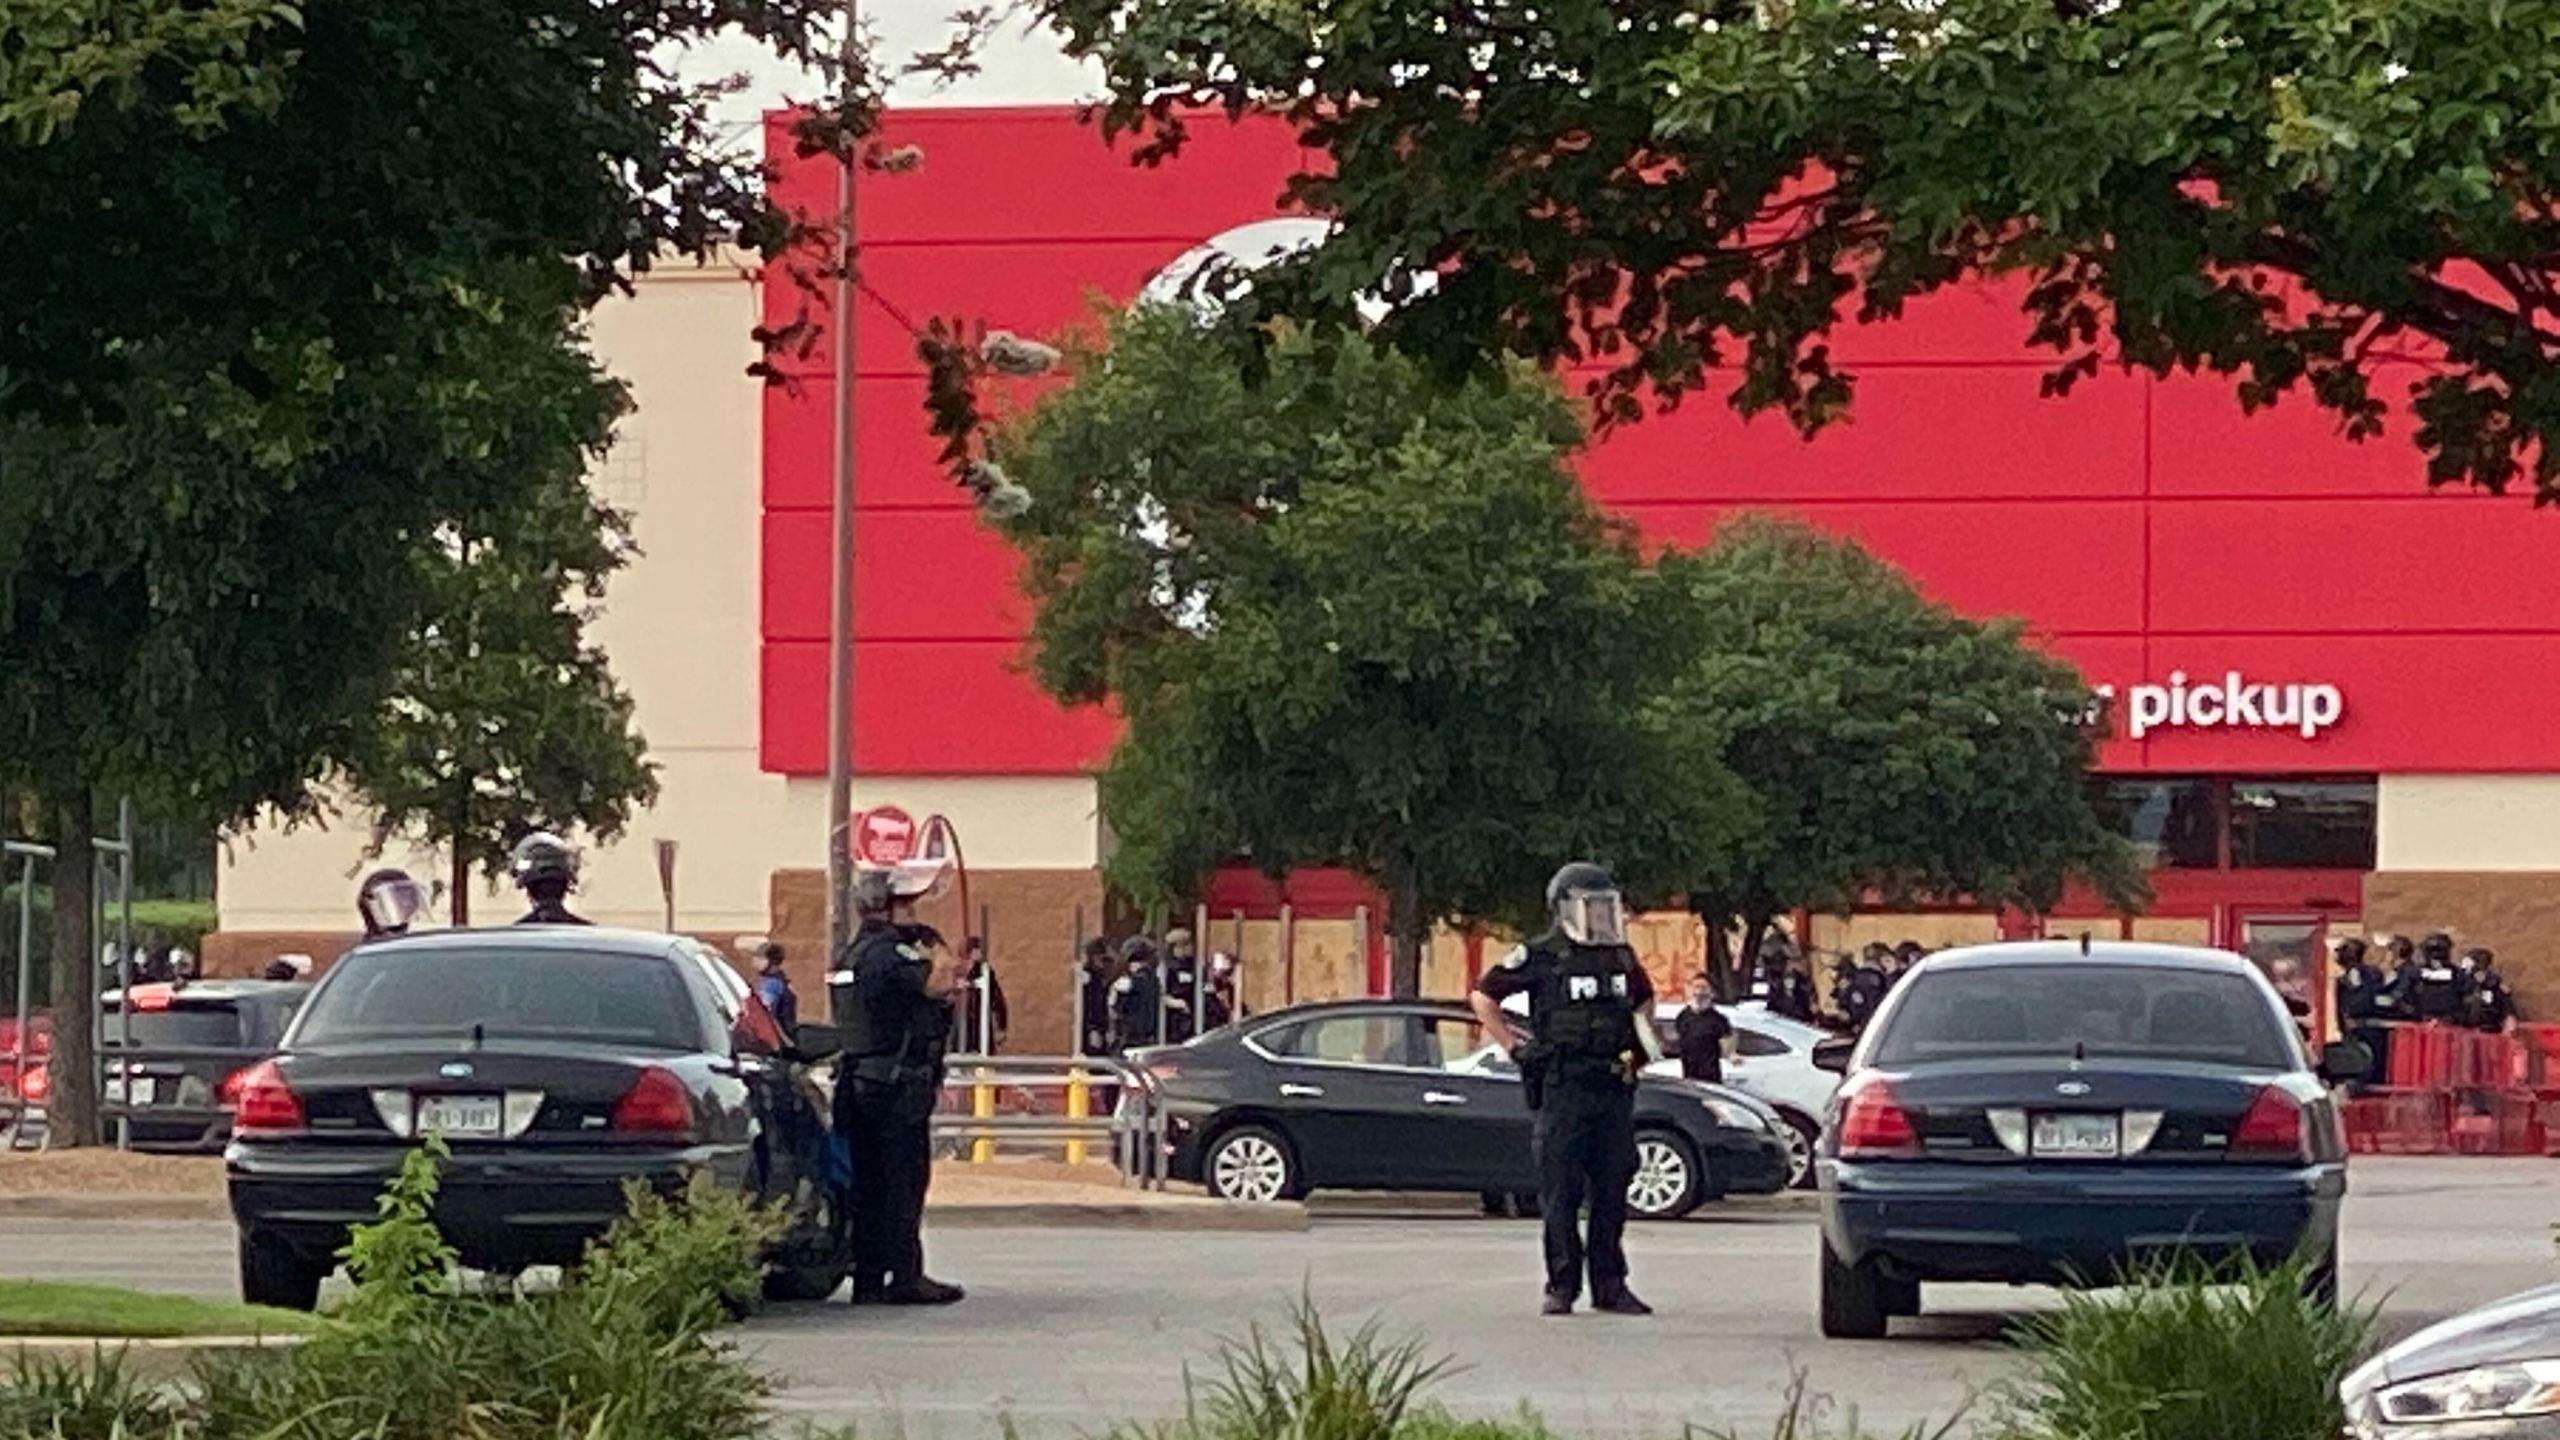 Austin police - looting at Capital Plaza target